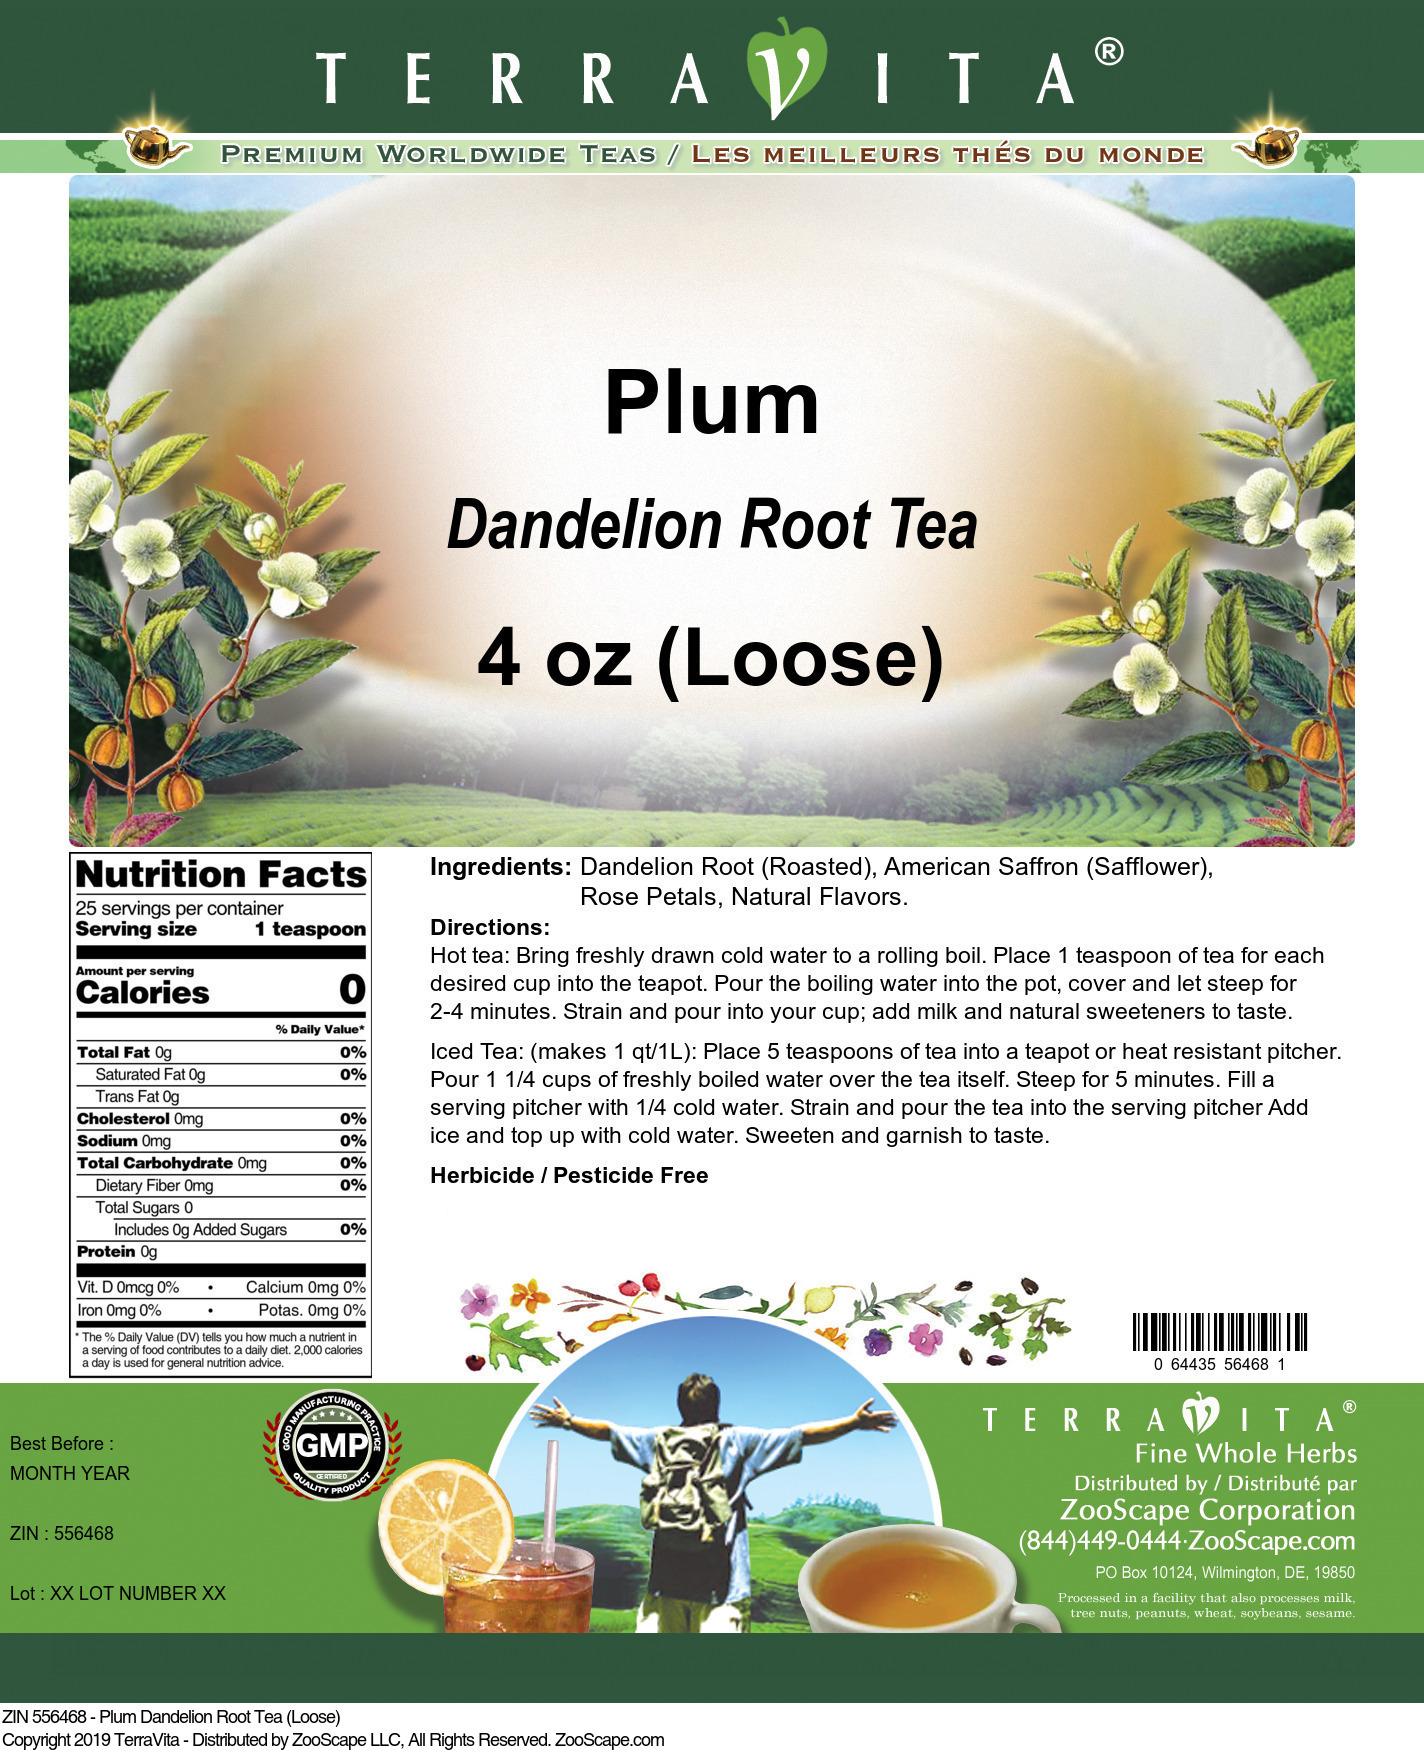 Plum Dandelion Root